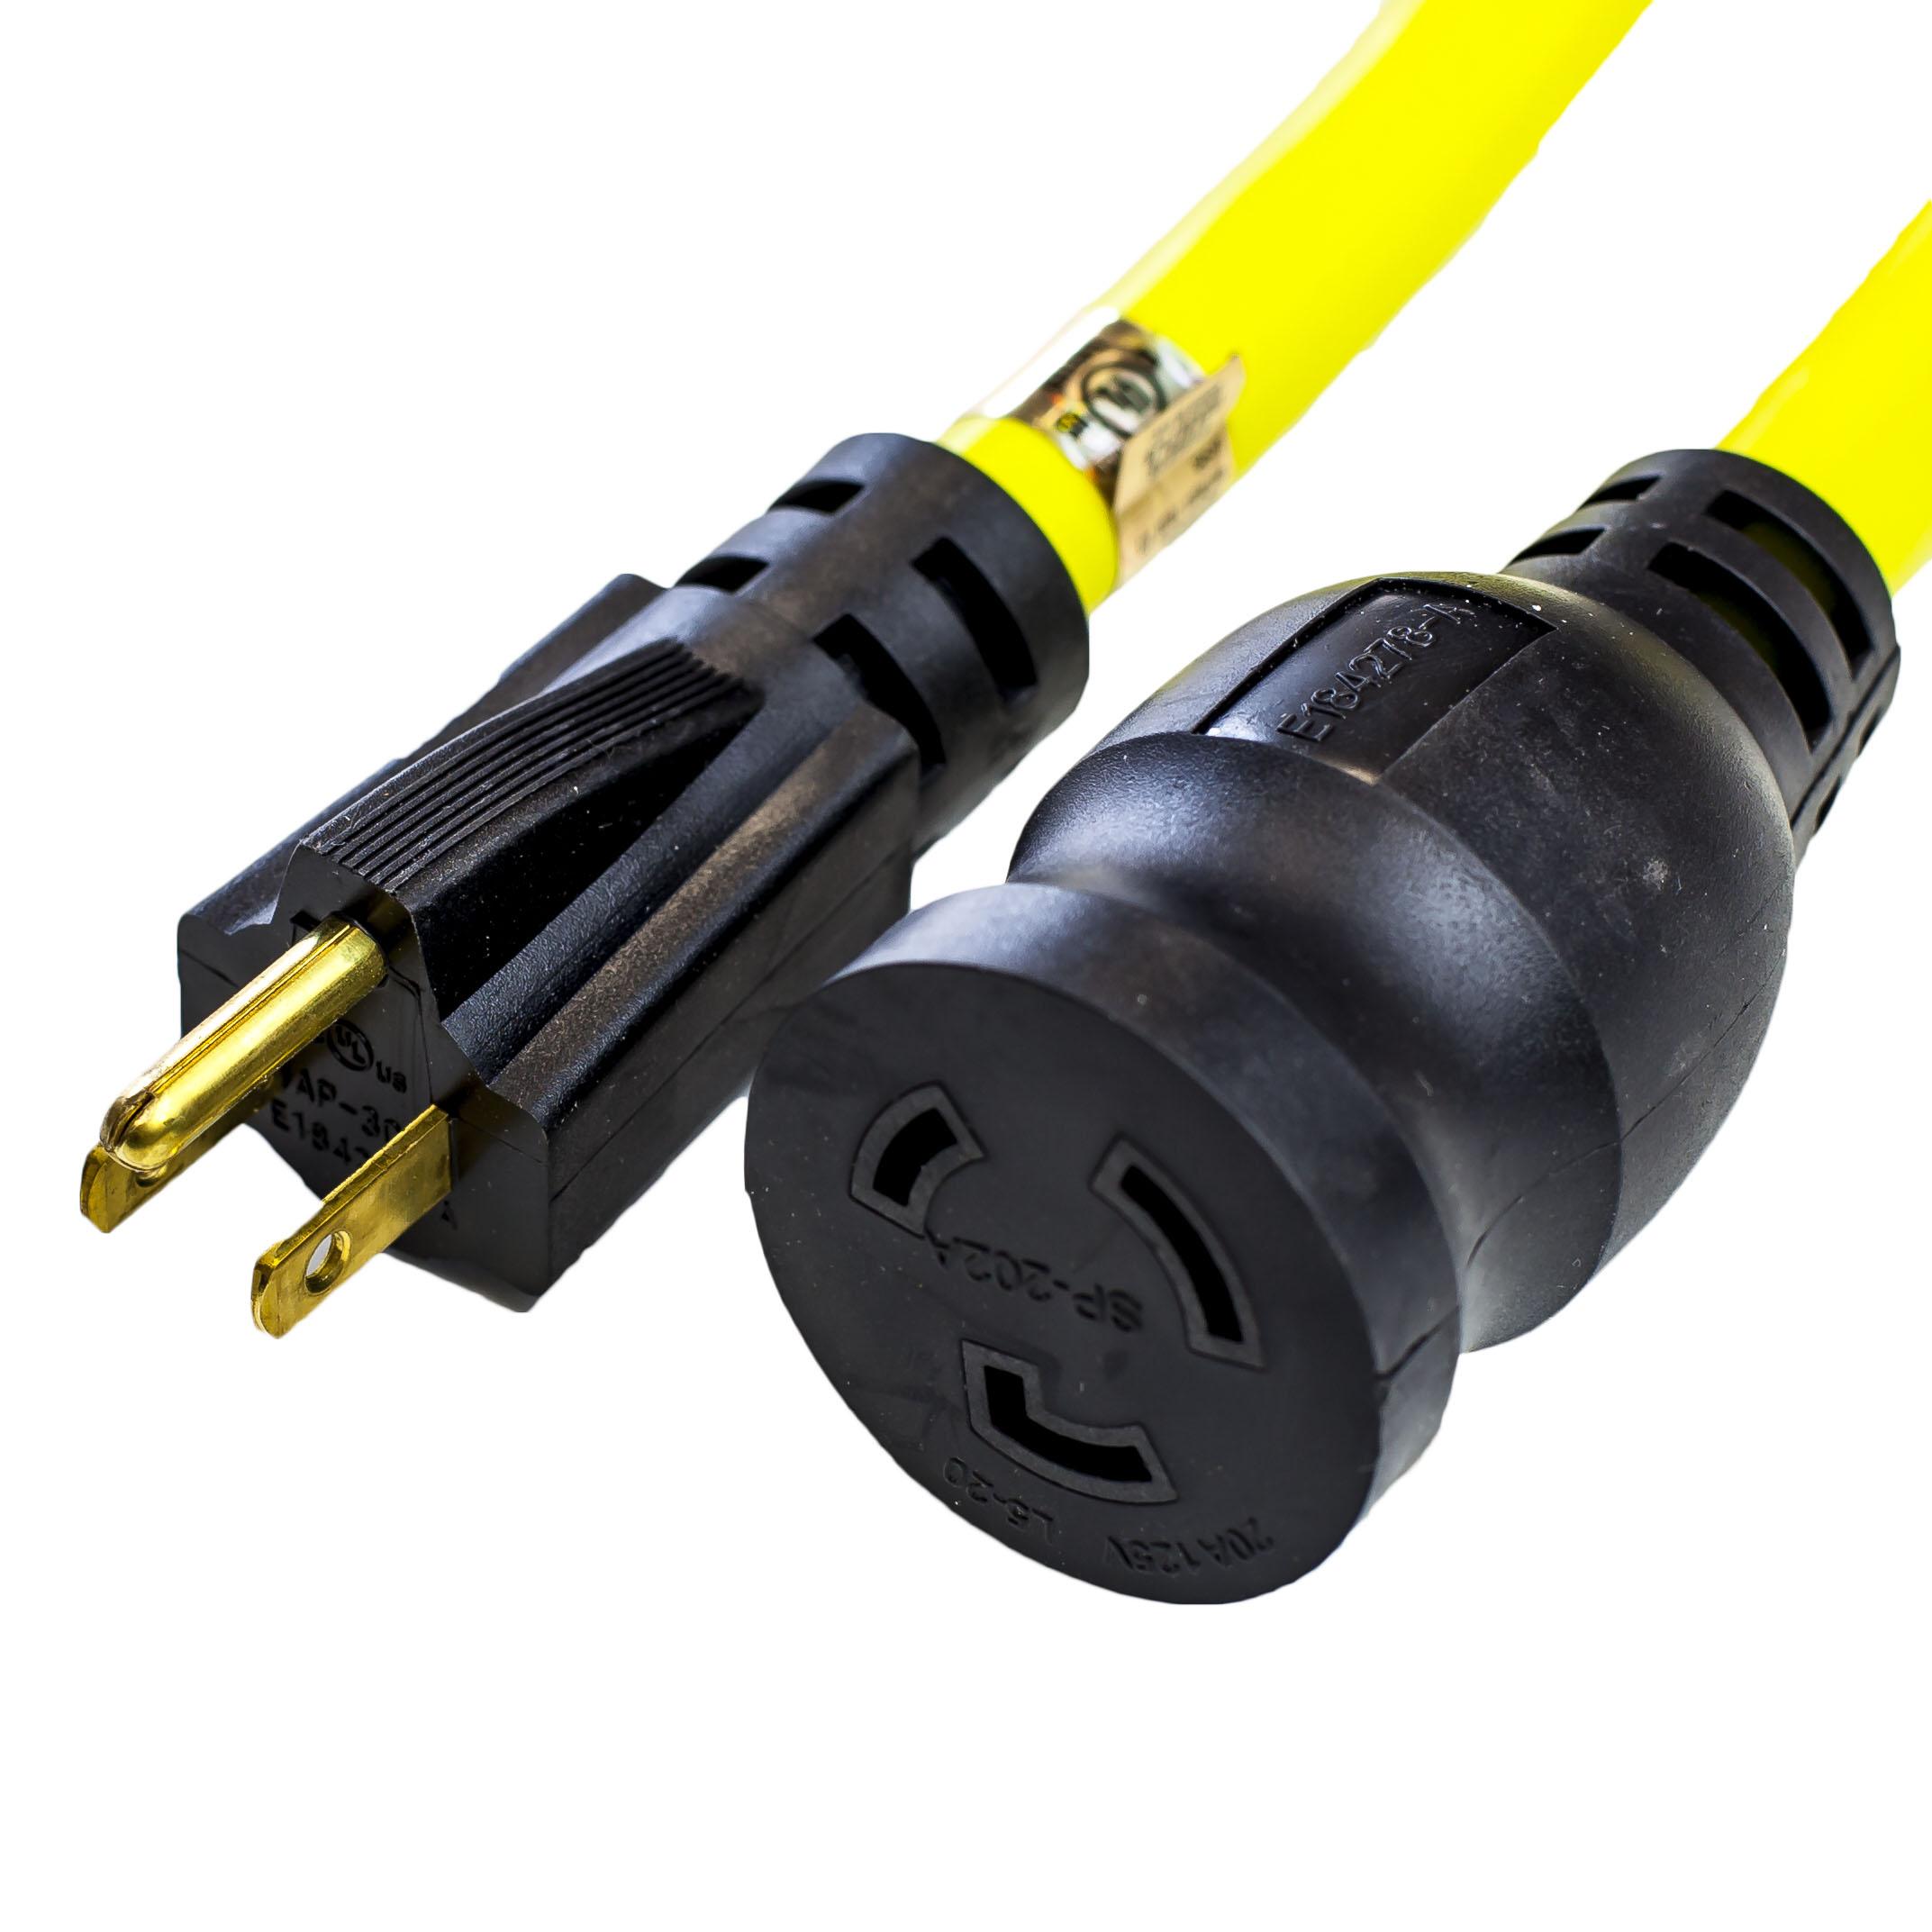 NEMA 5-15P Adapter Cords